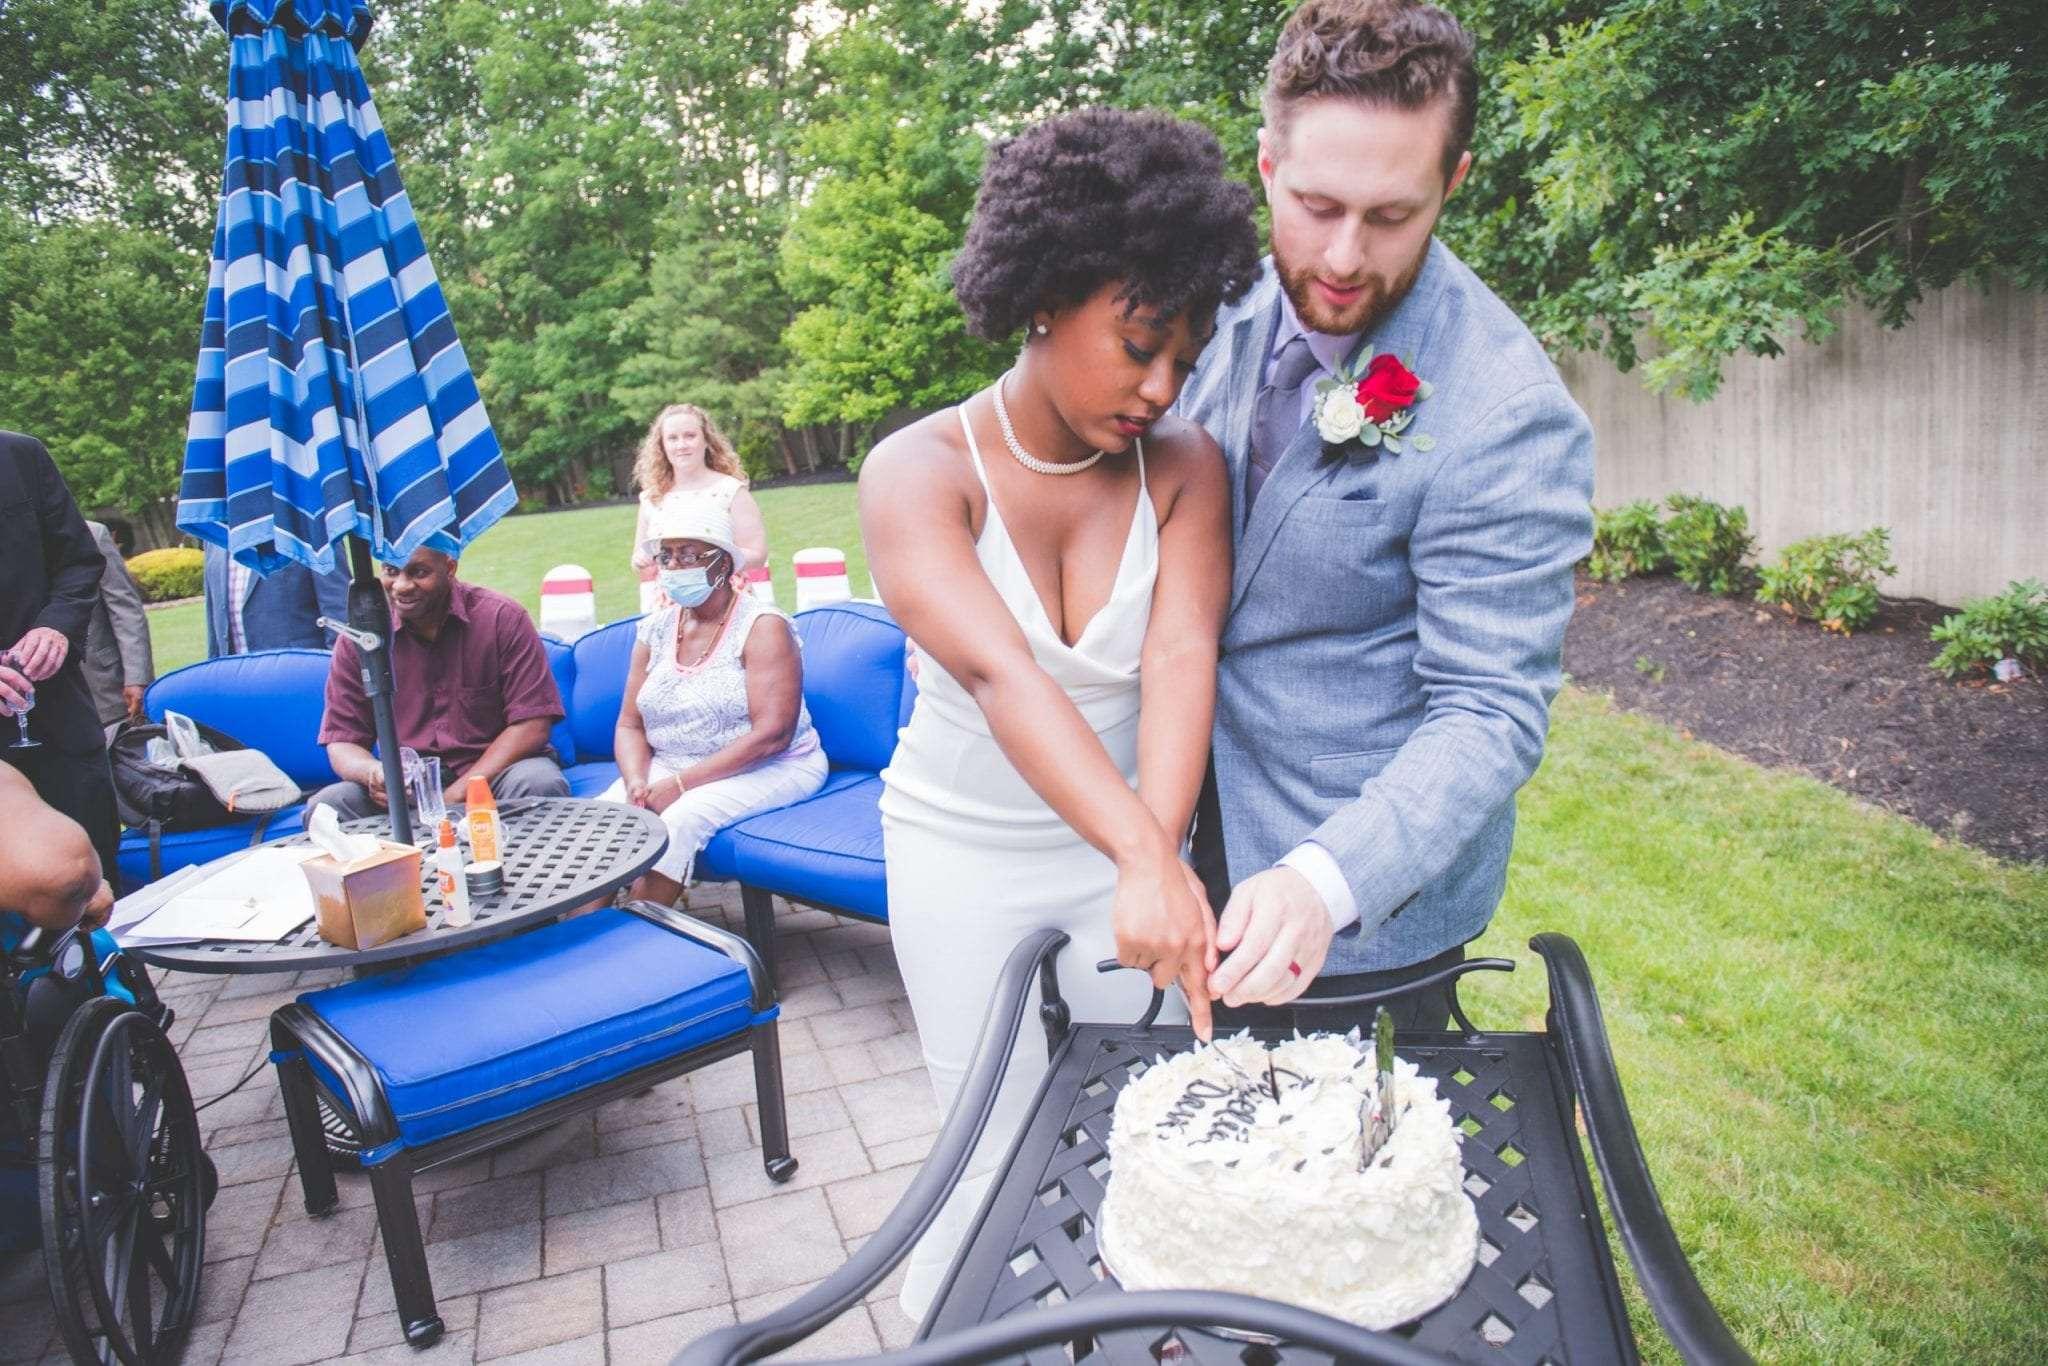 New Jersey backyard Micro wedding